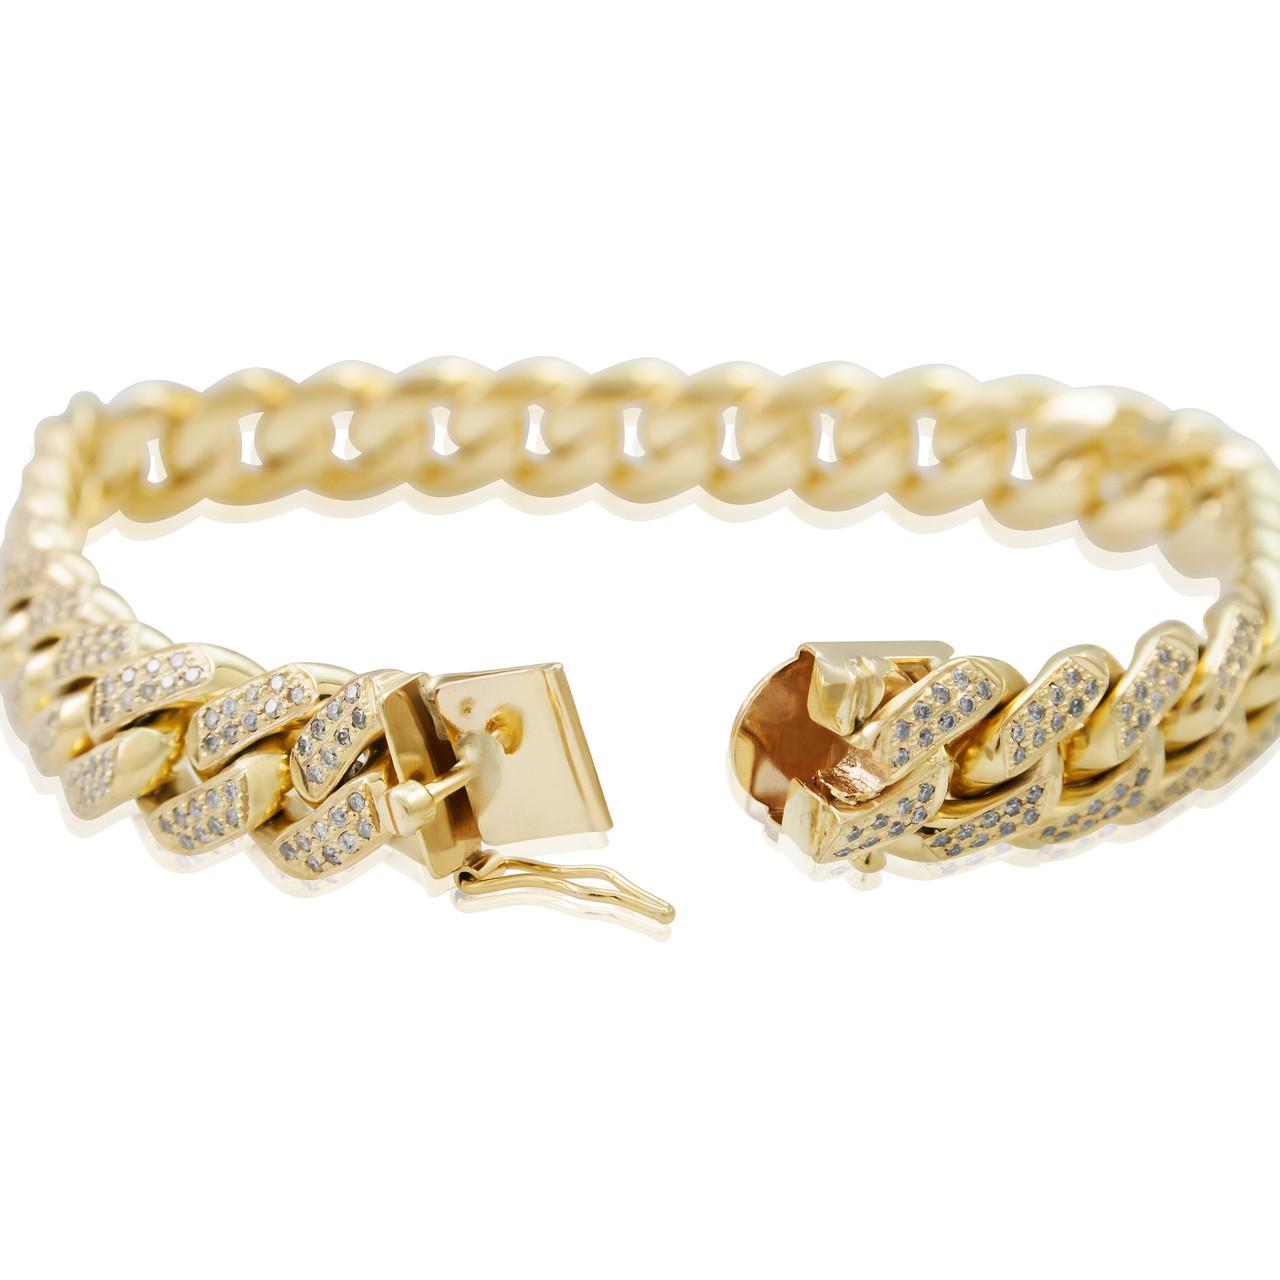 0432676aa8e36 10k Yellow Gold 8.5ct Diamond Miami Cuban Link Bracelet